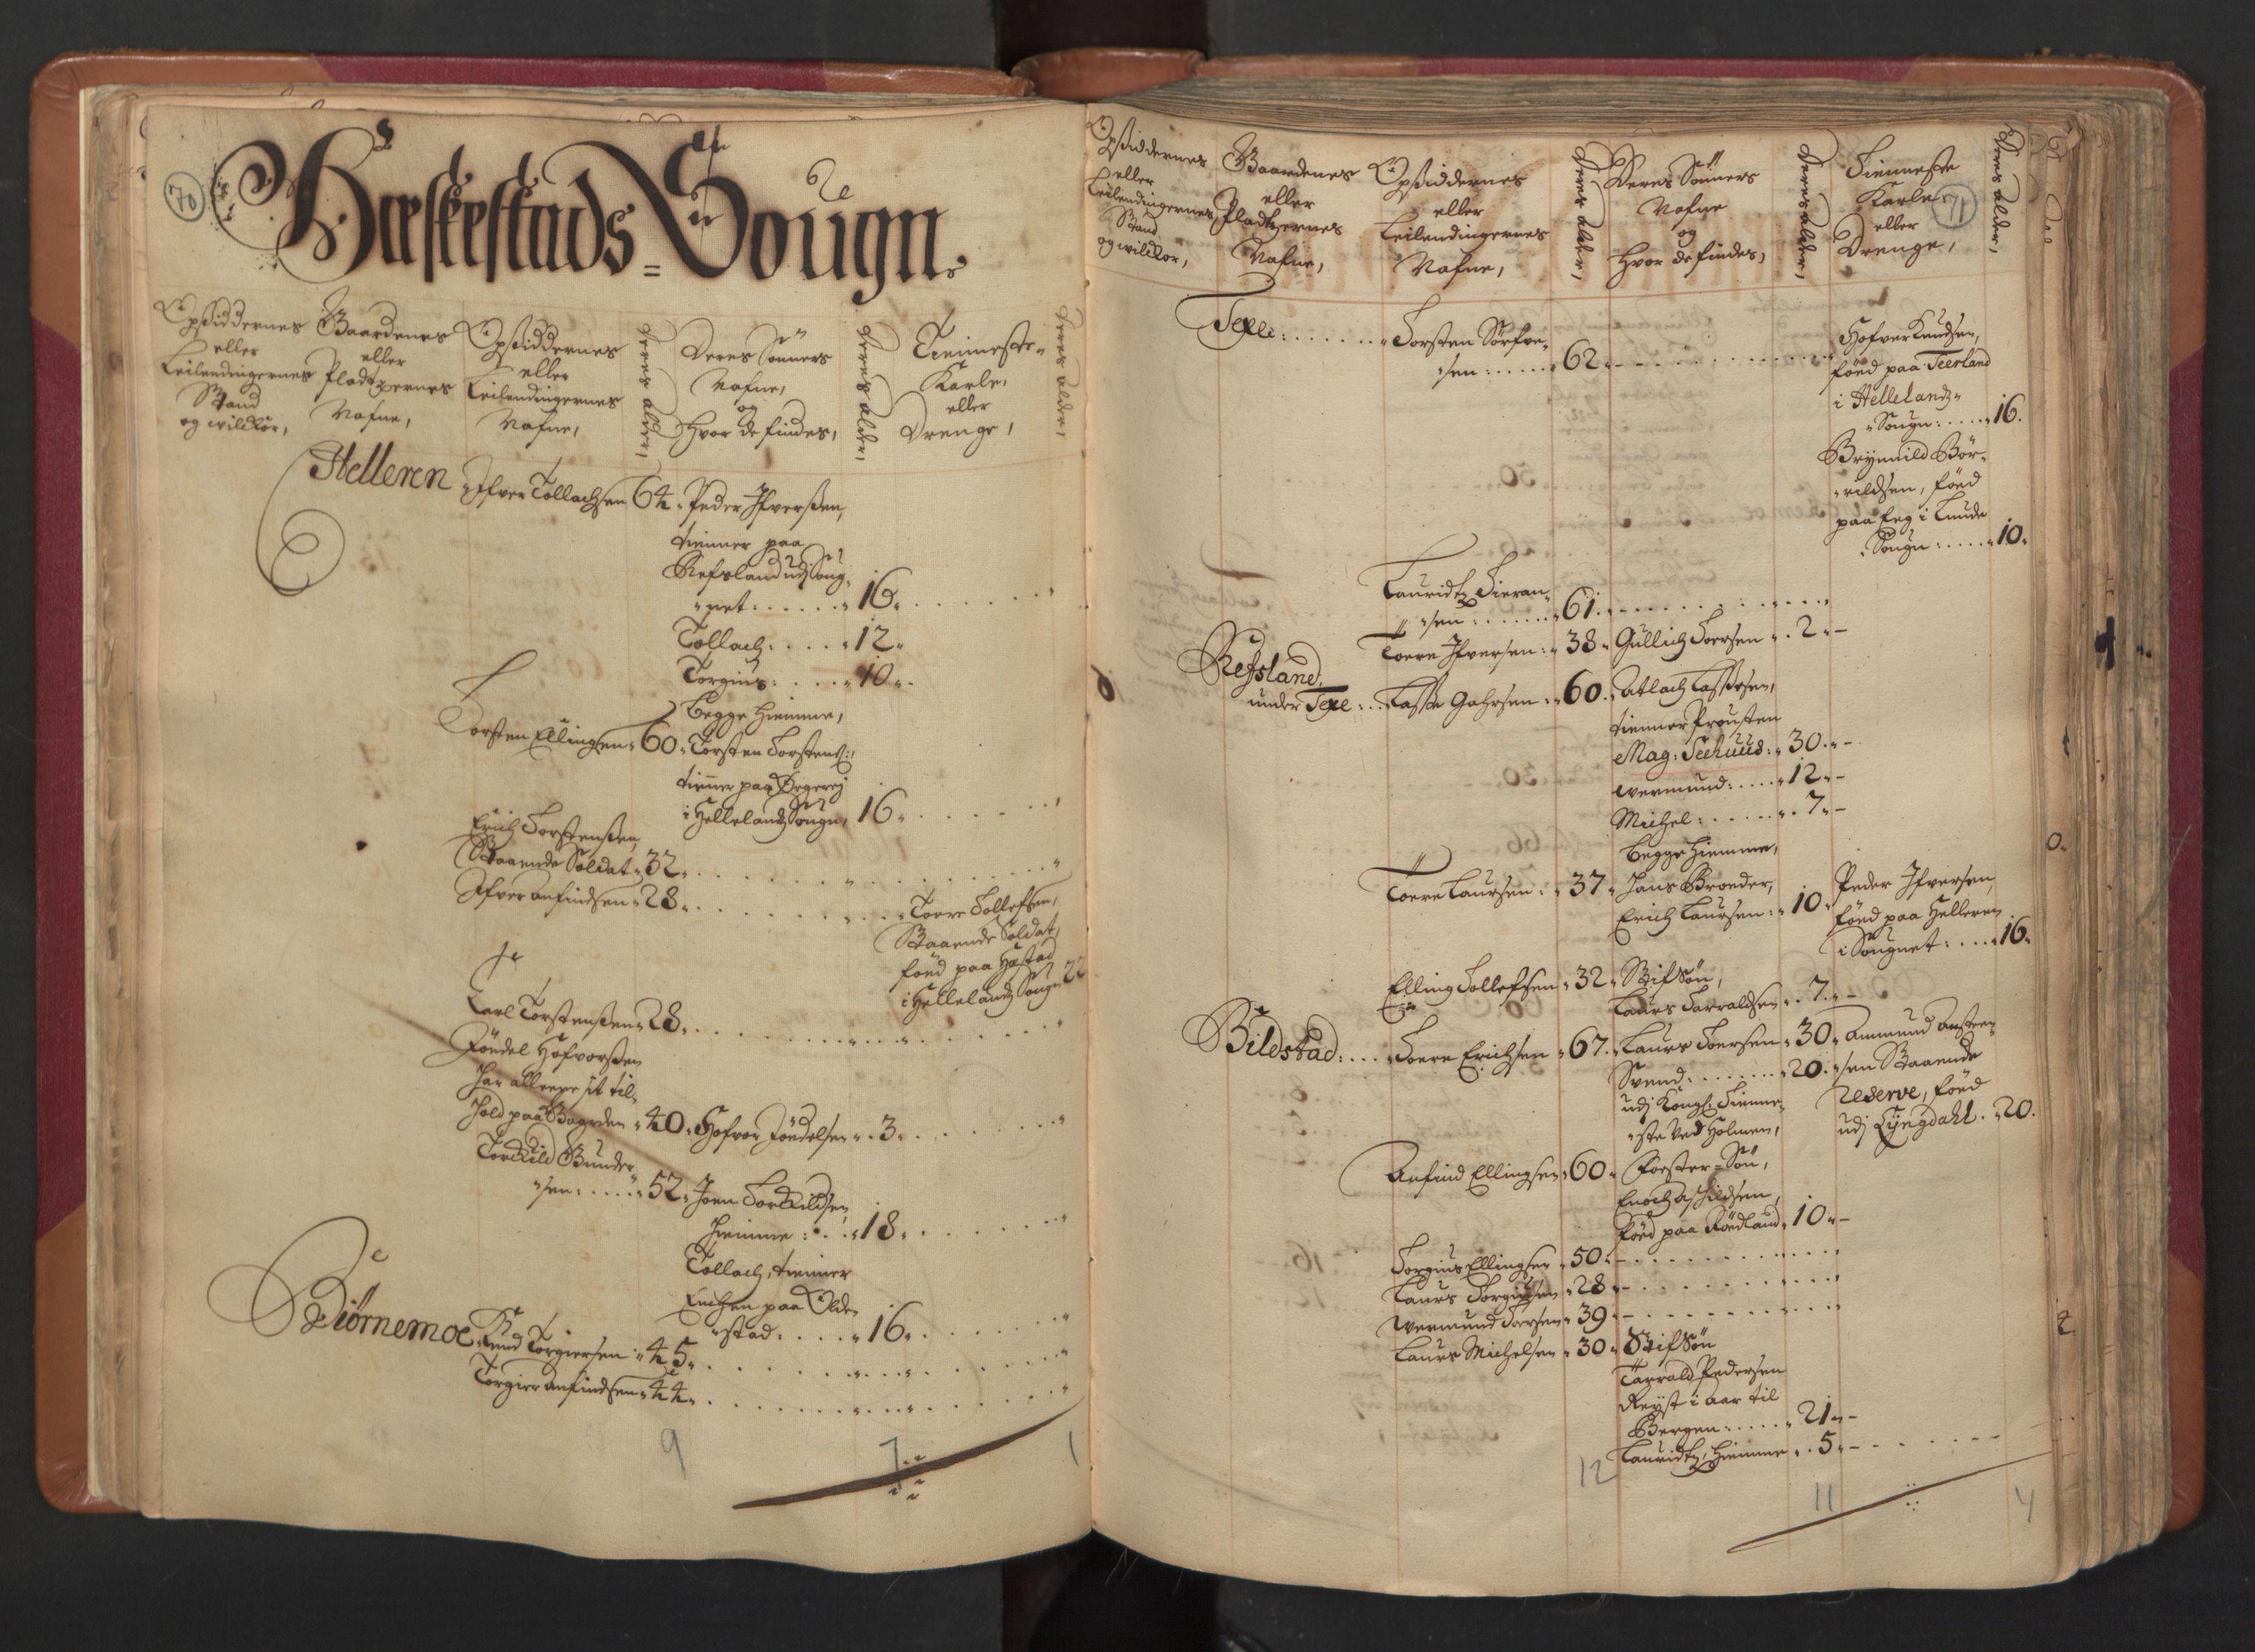 RA, Manntallet 1701, nr. 4: Jæren og Dalane fogderi, 1701, s. 70-71